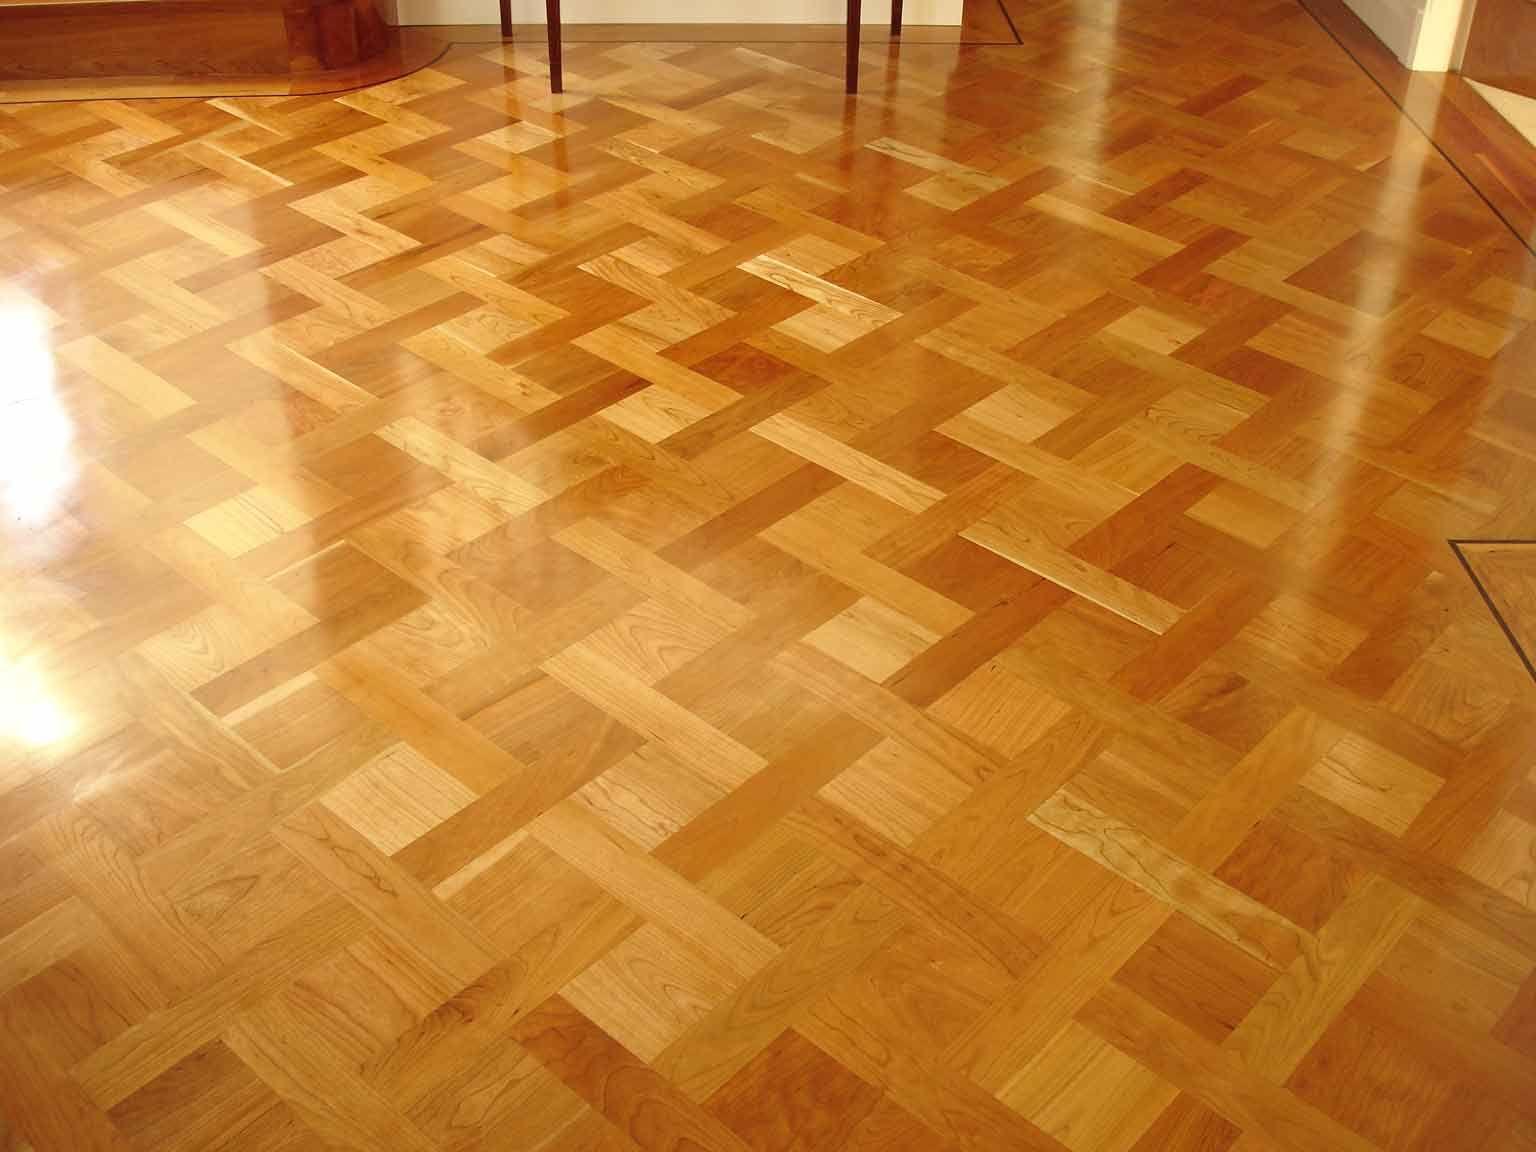 Parquet Wood Flooring Clear Hardwood Parquet Flooring 00 Front